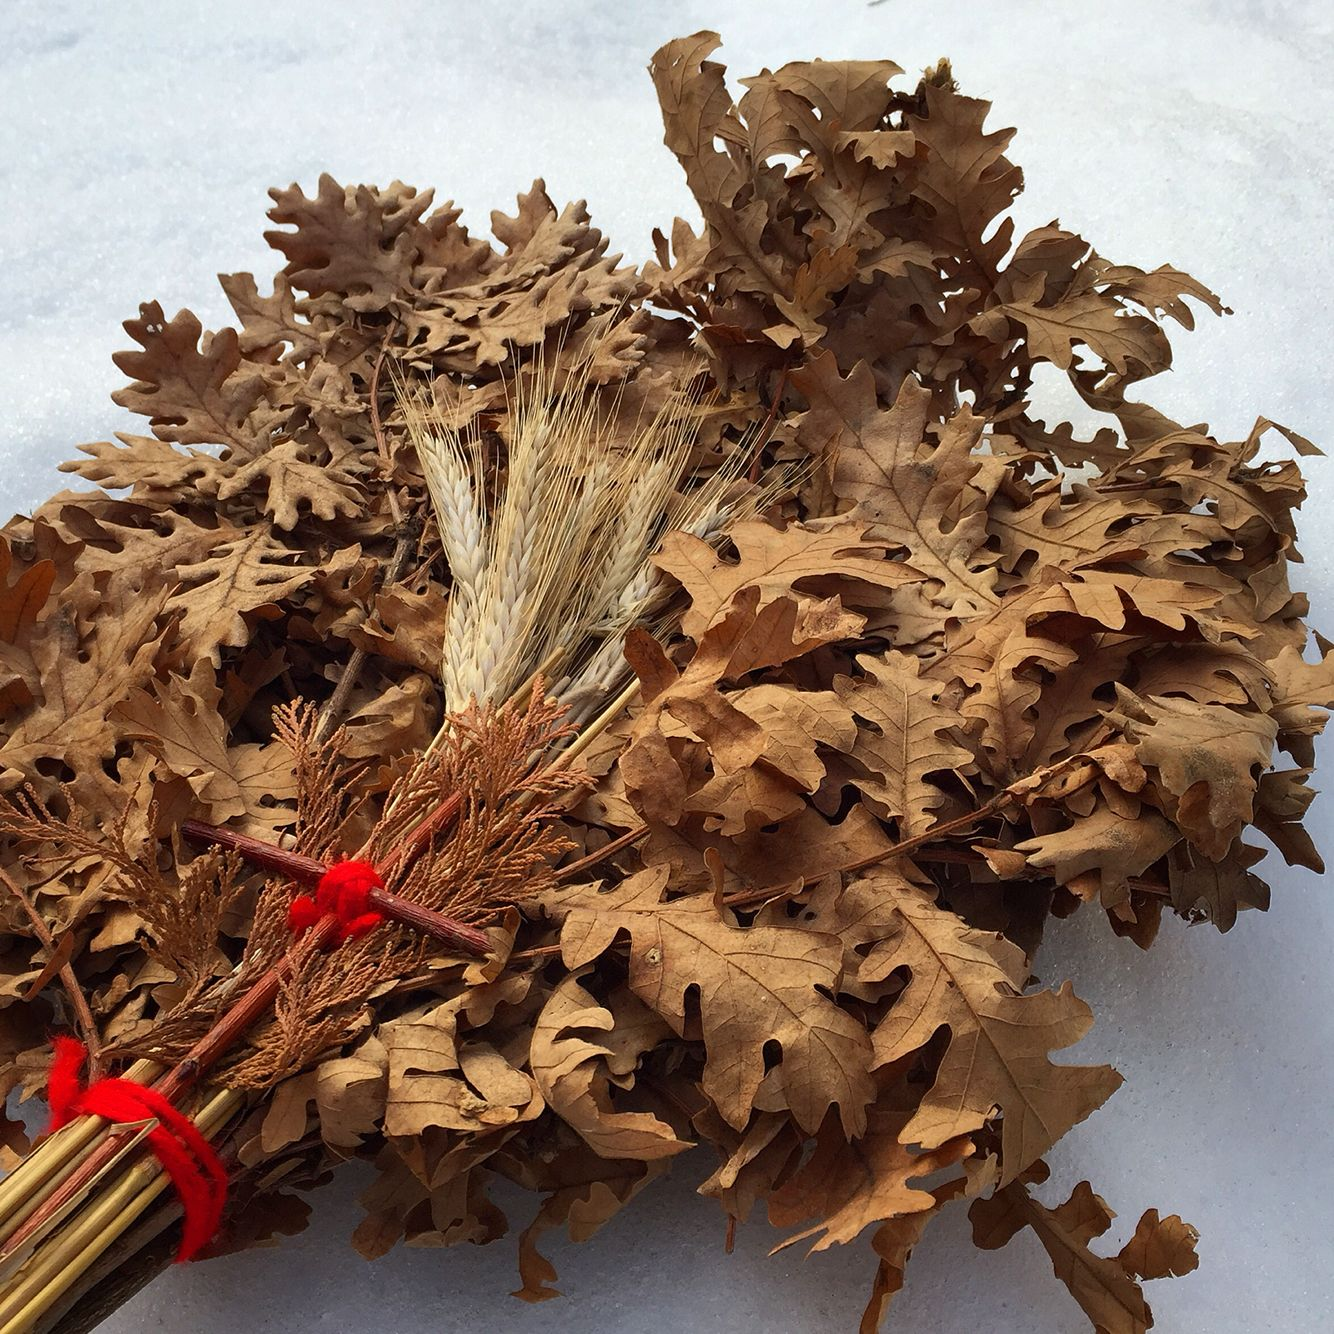 Badnjak/Oak branchChristmas tradition Christmas decor